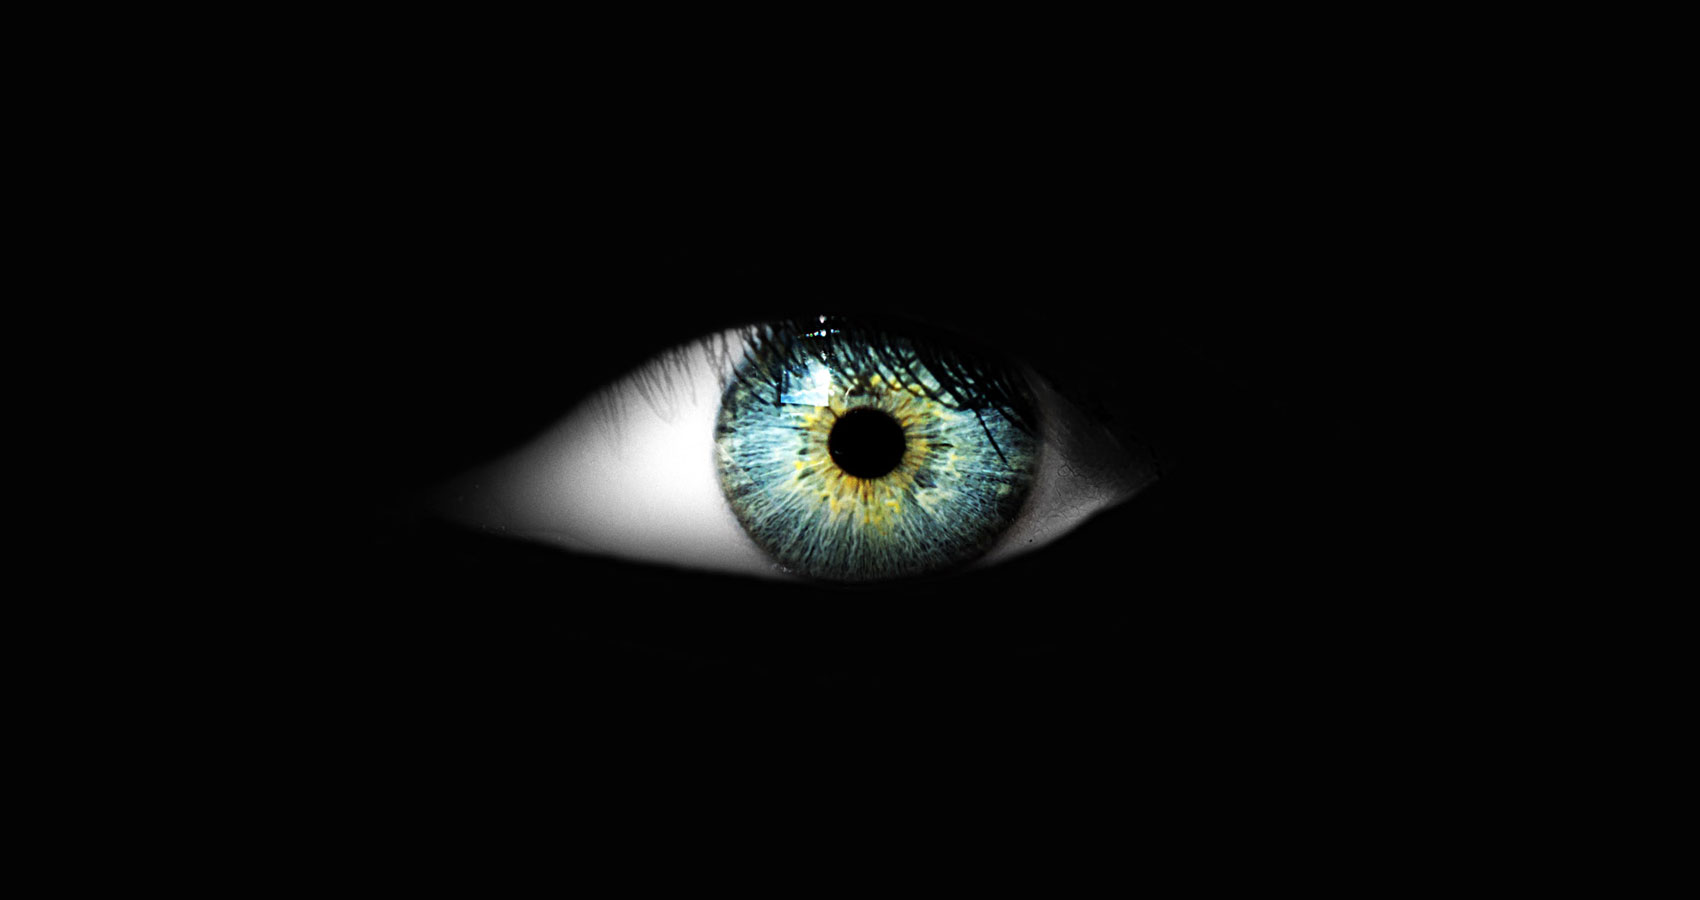 Third Eye written by NikNik at Spillwords.com